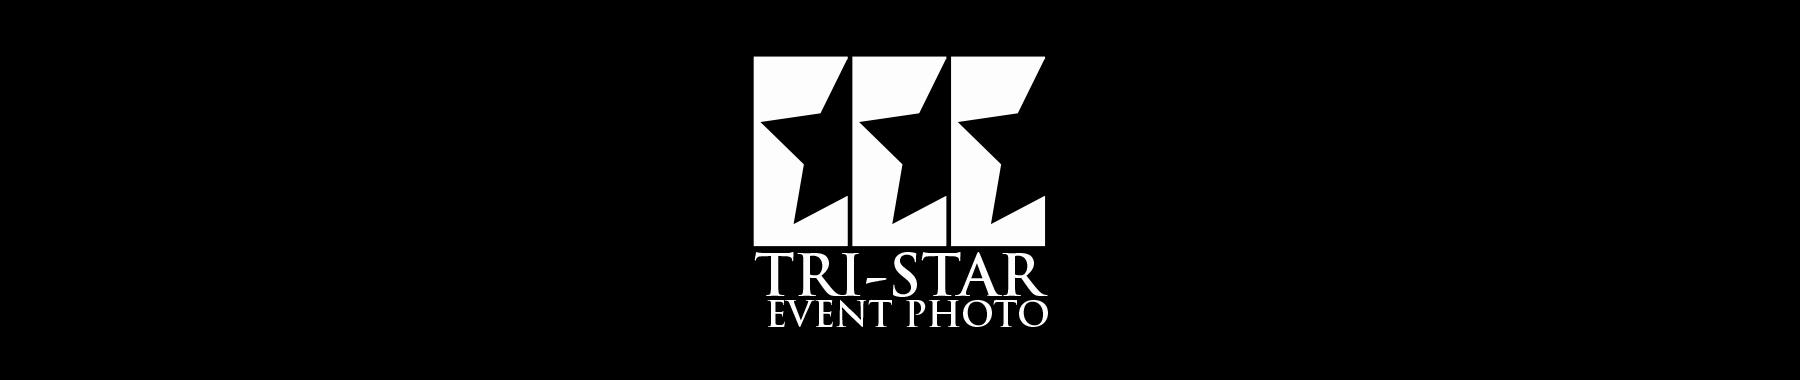 tri star logo.jpg